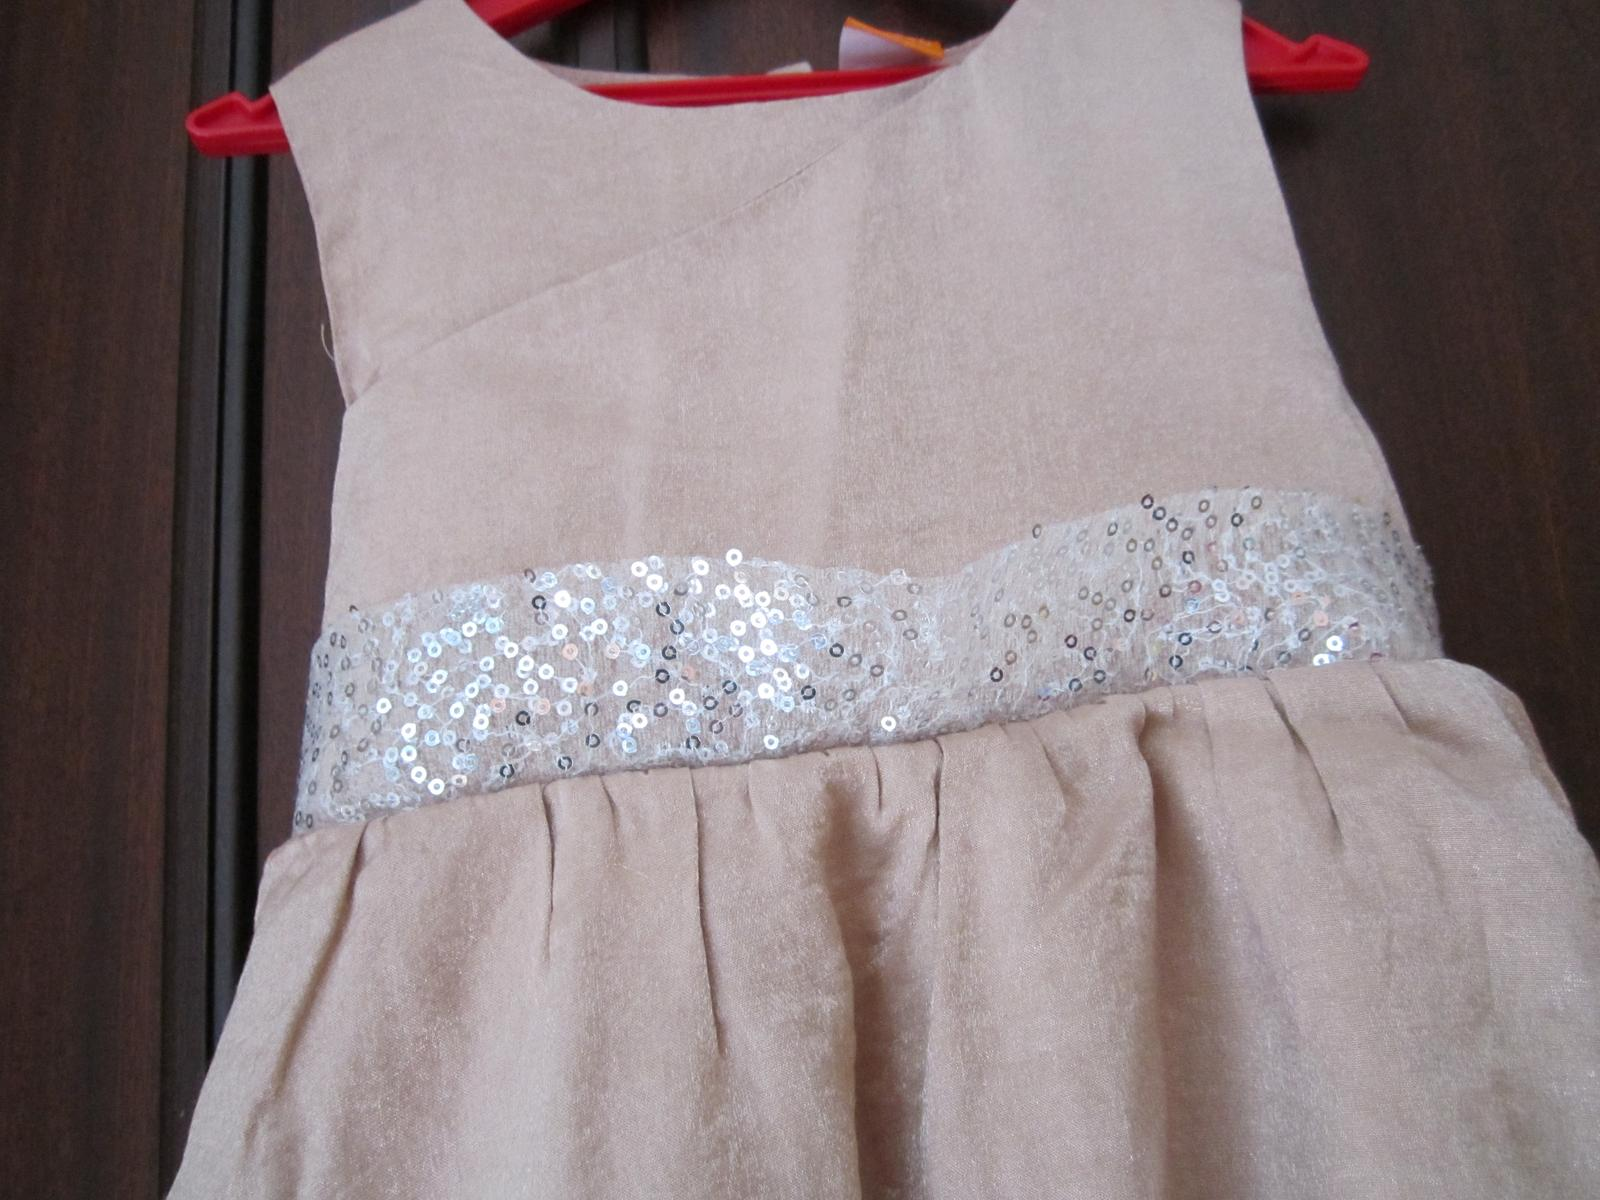 šaty - Obrázok č. 2